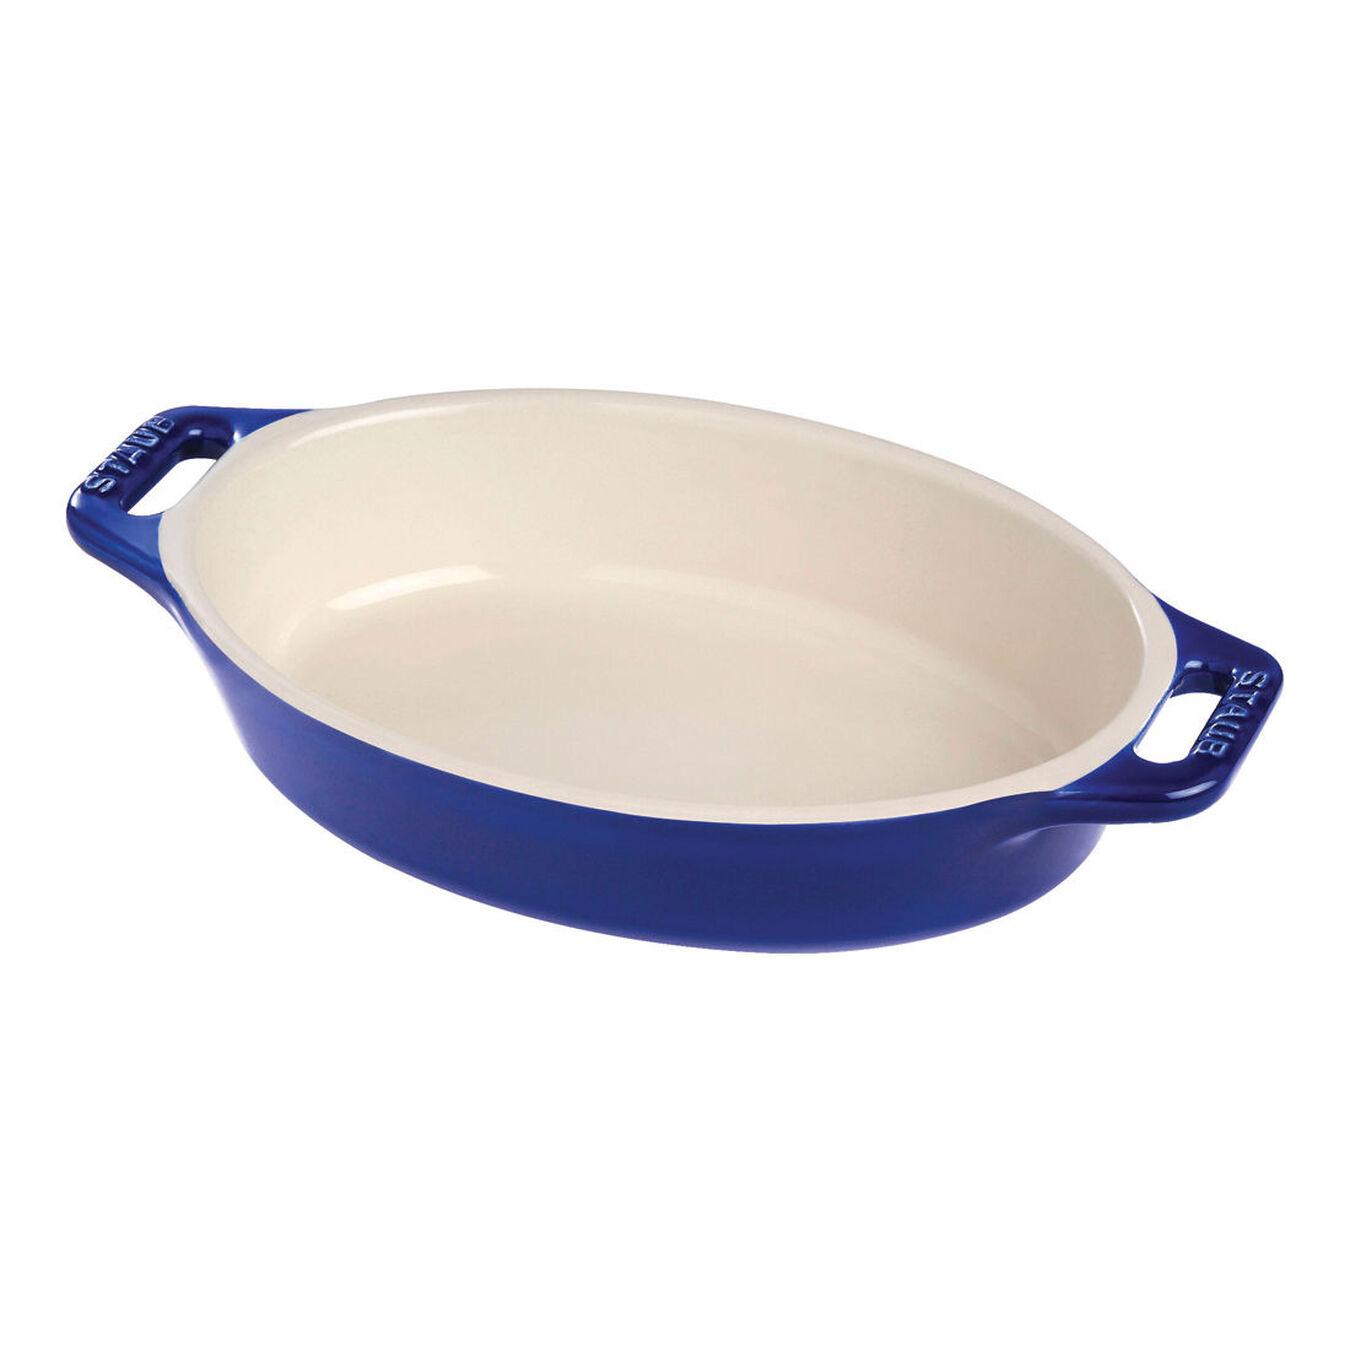 11-inch, oval, Special shape bakeware, dark blue,,large 1